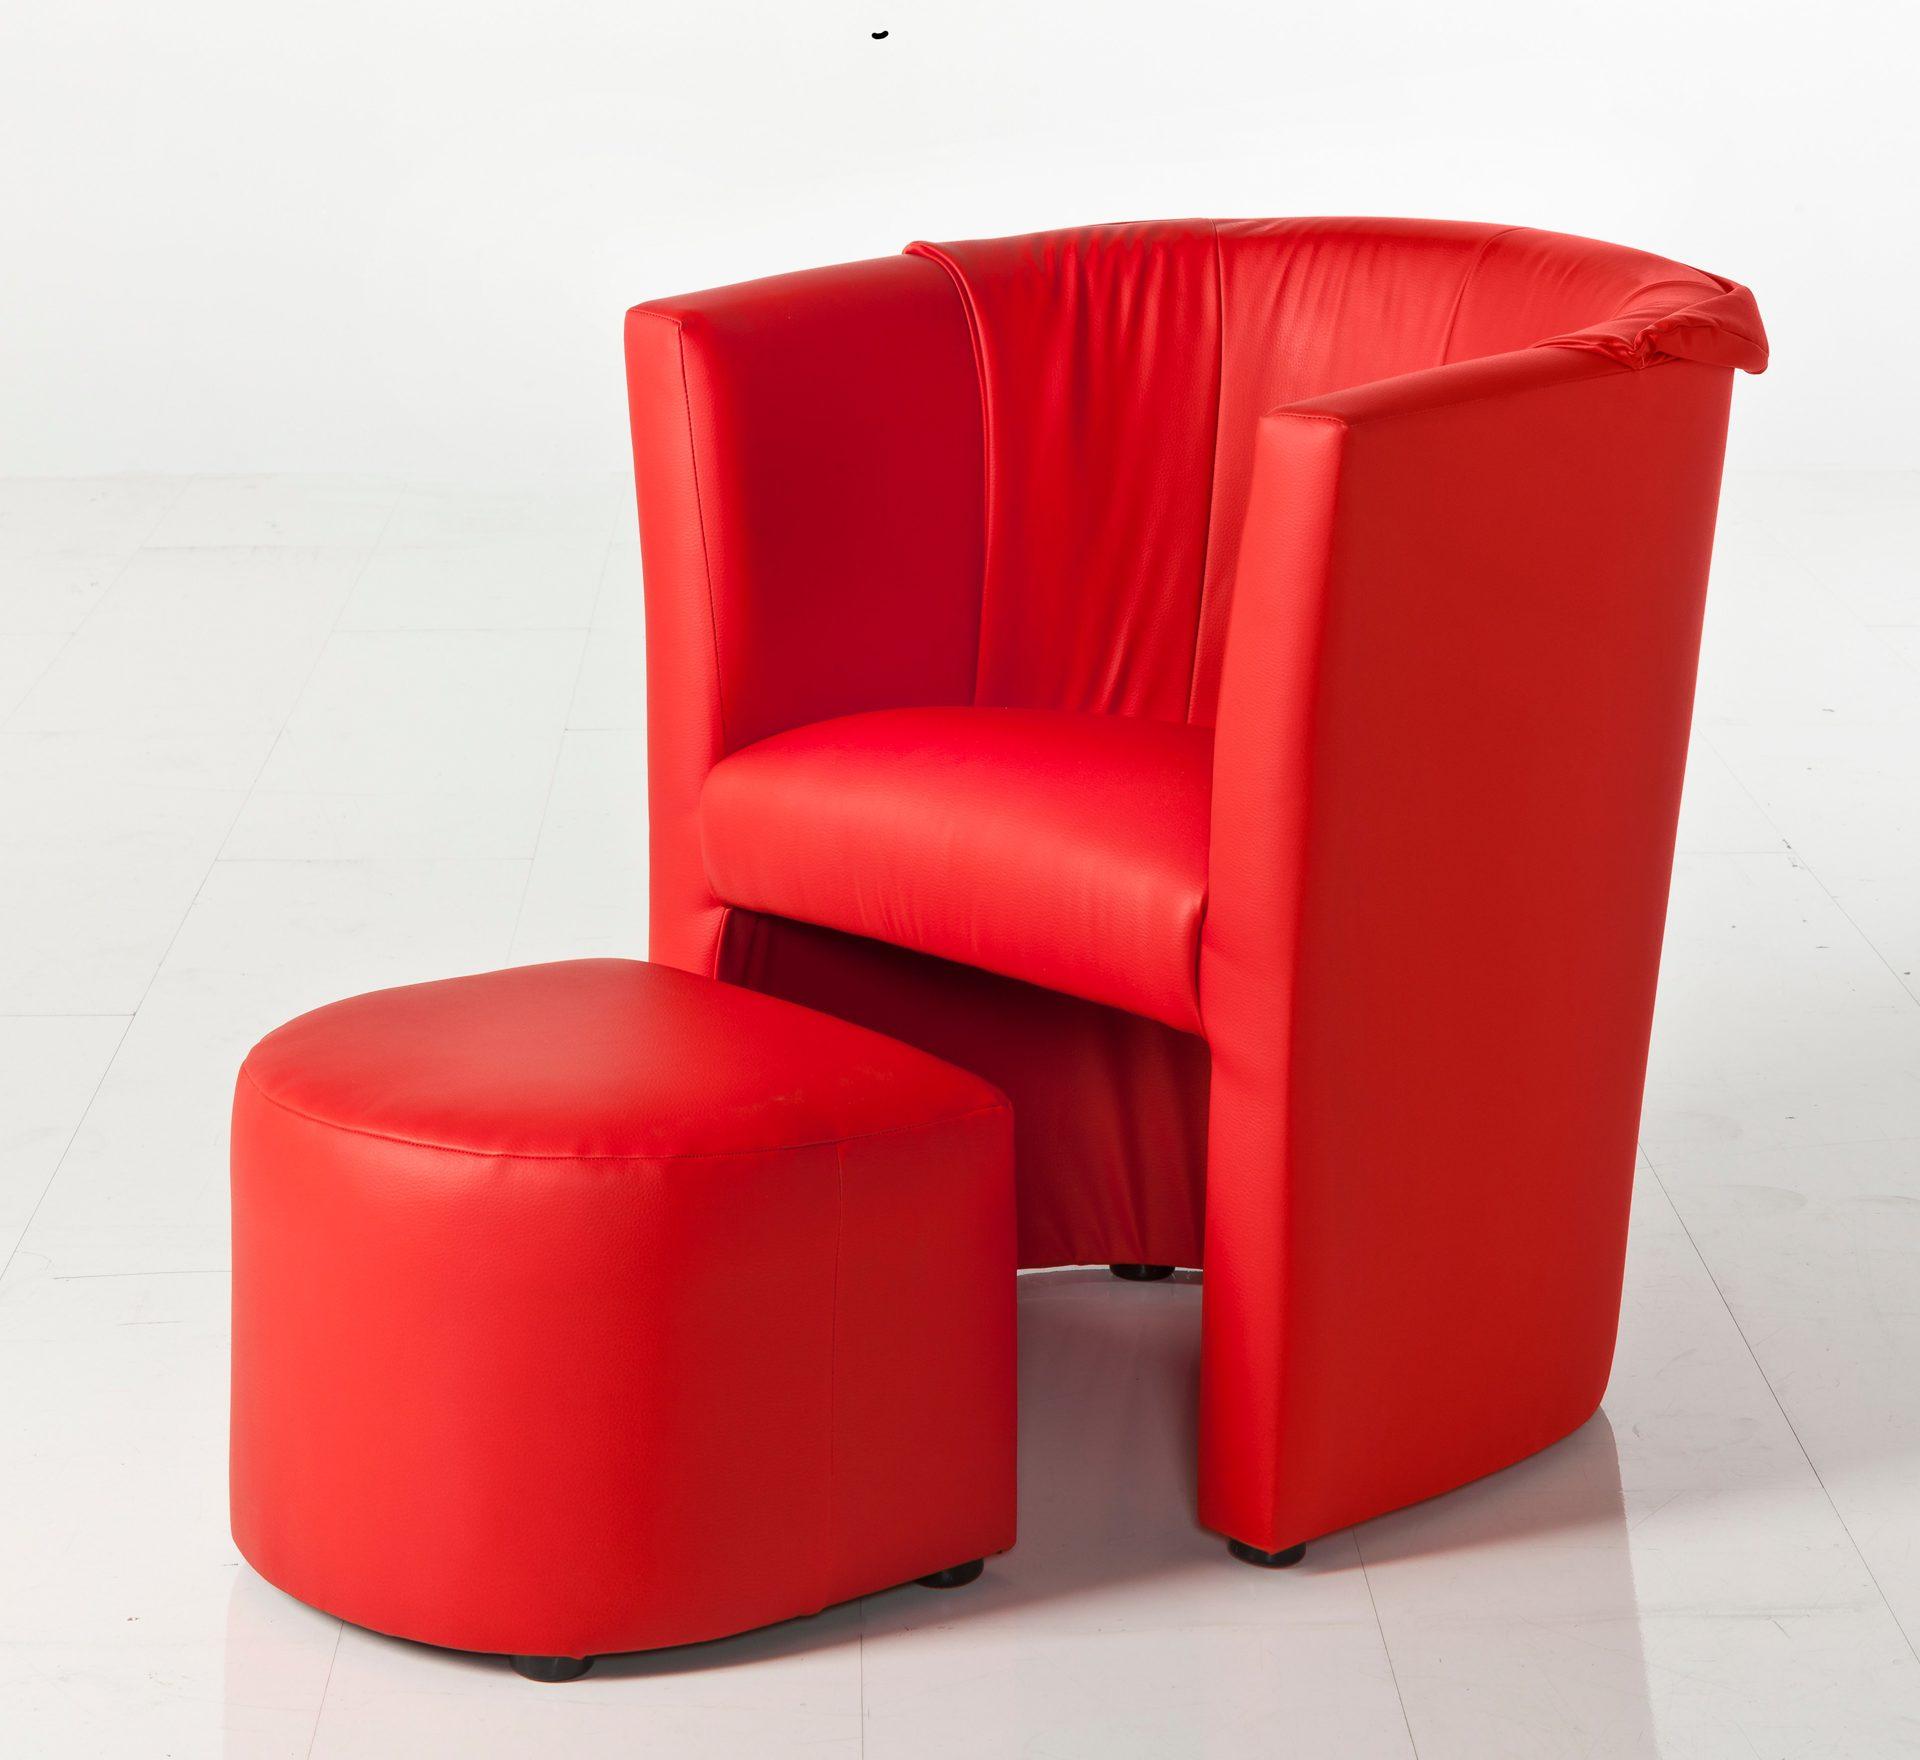 Möbel Boer Coesfeld Räume Jugendzimmer Kinderzimmer Sessel